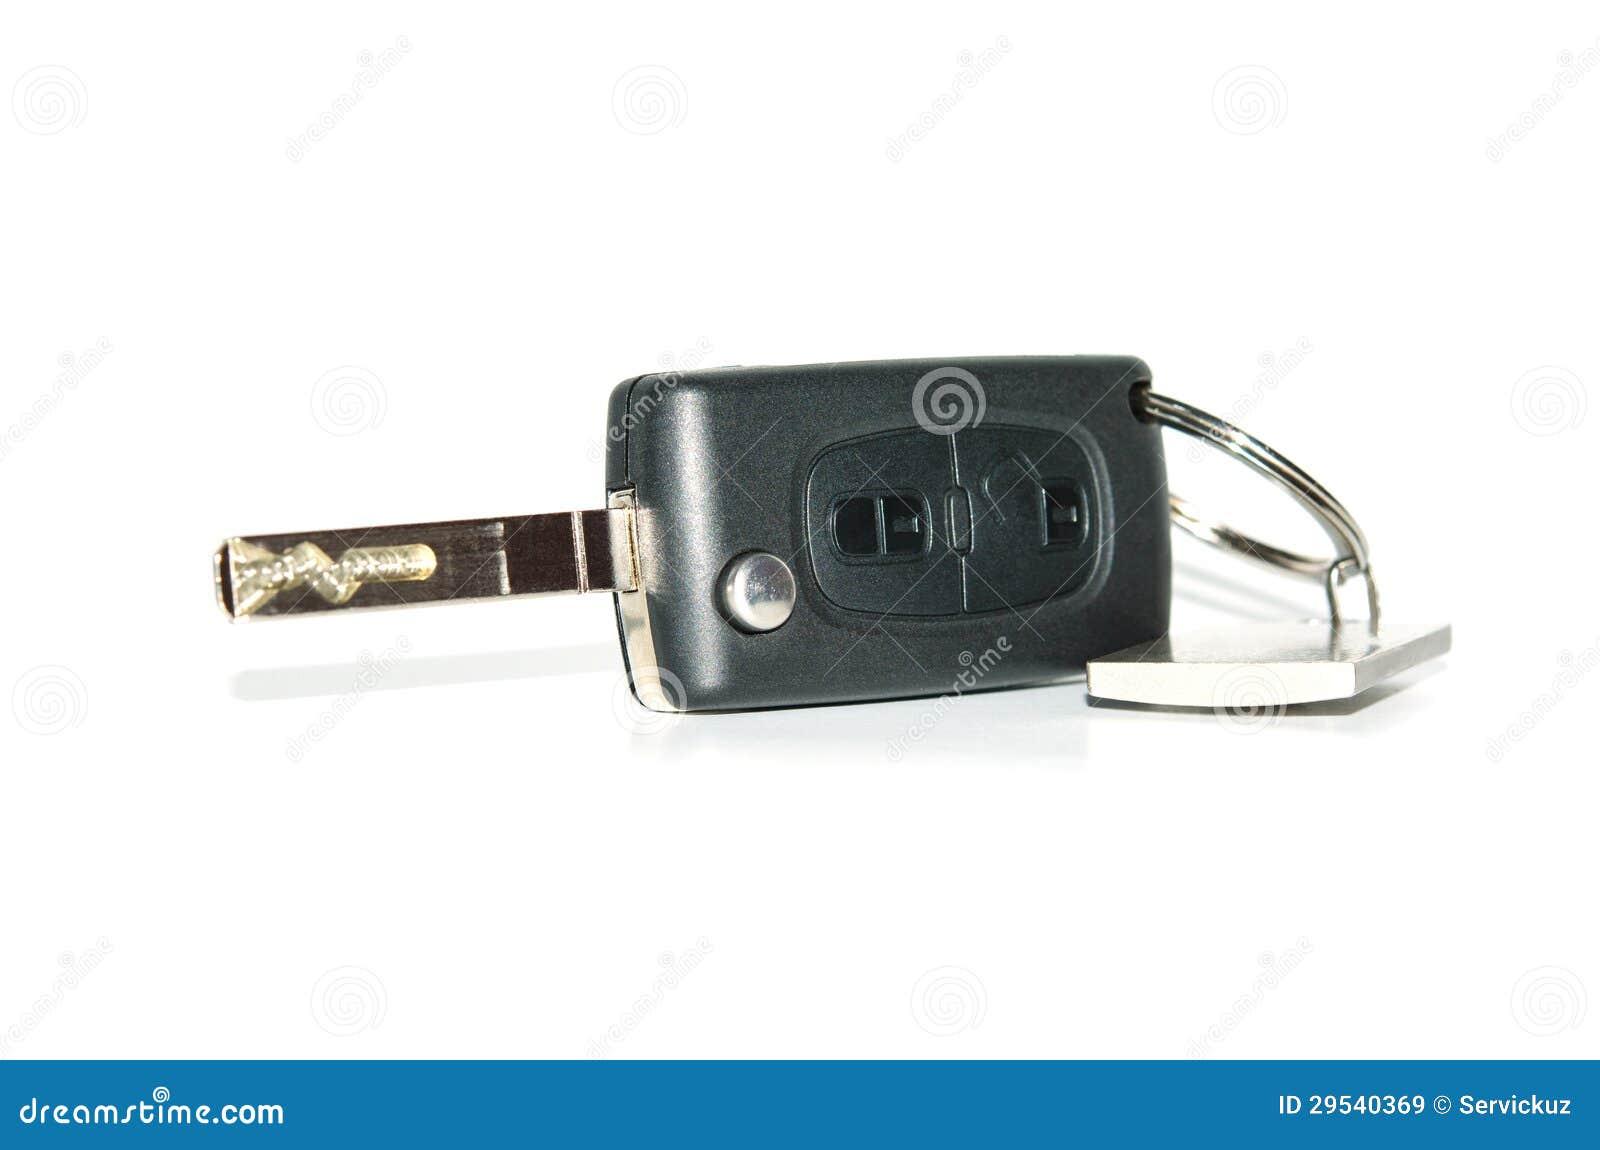 Chave de controle remoto do automóvel com keychain